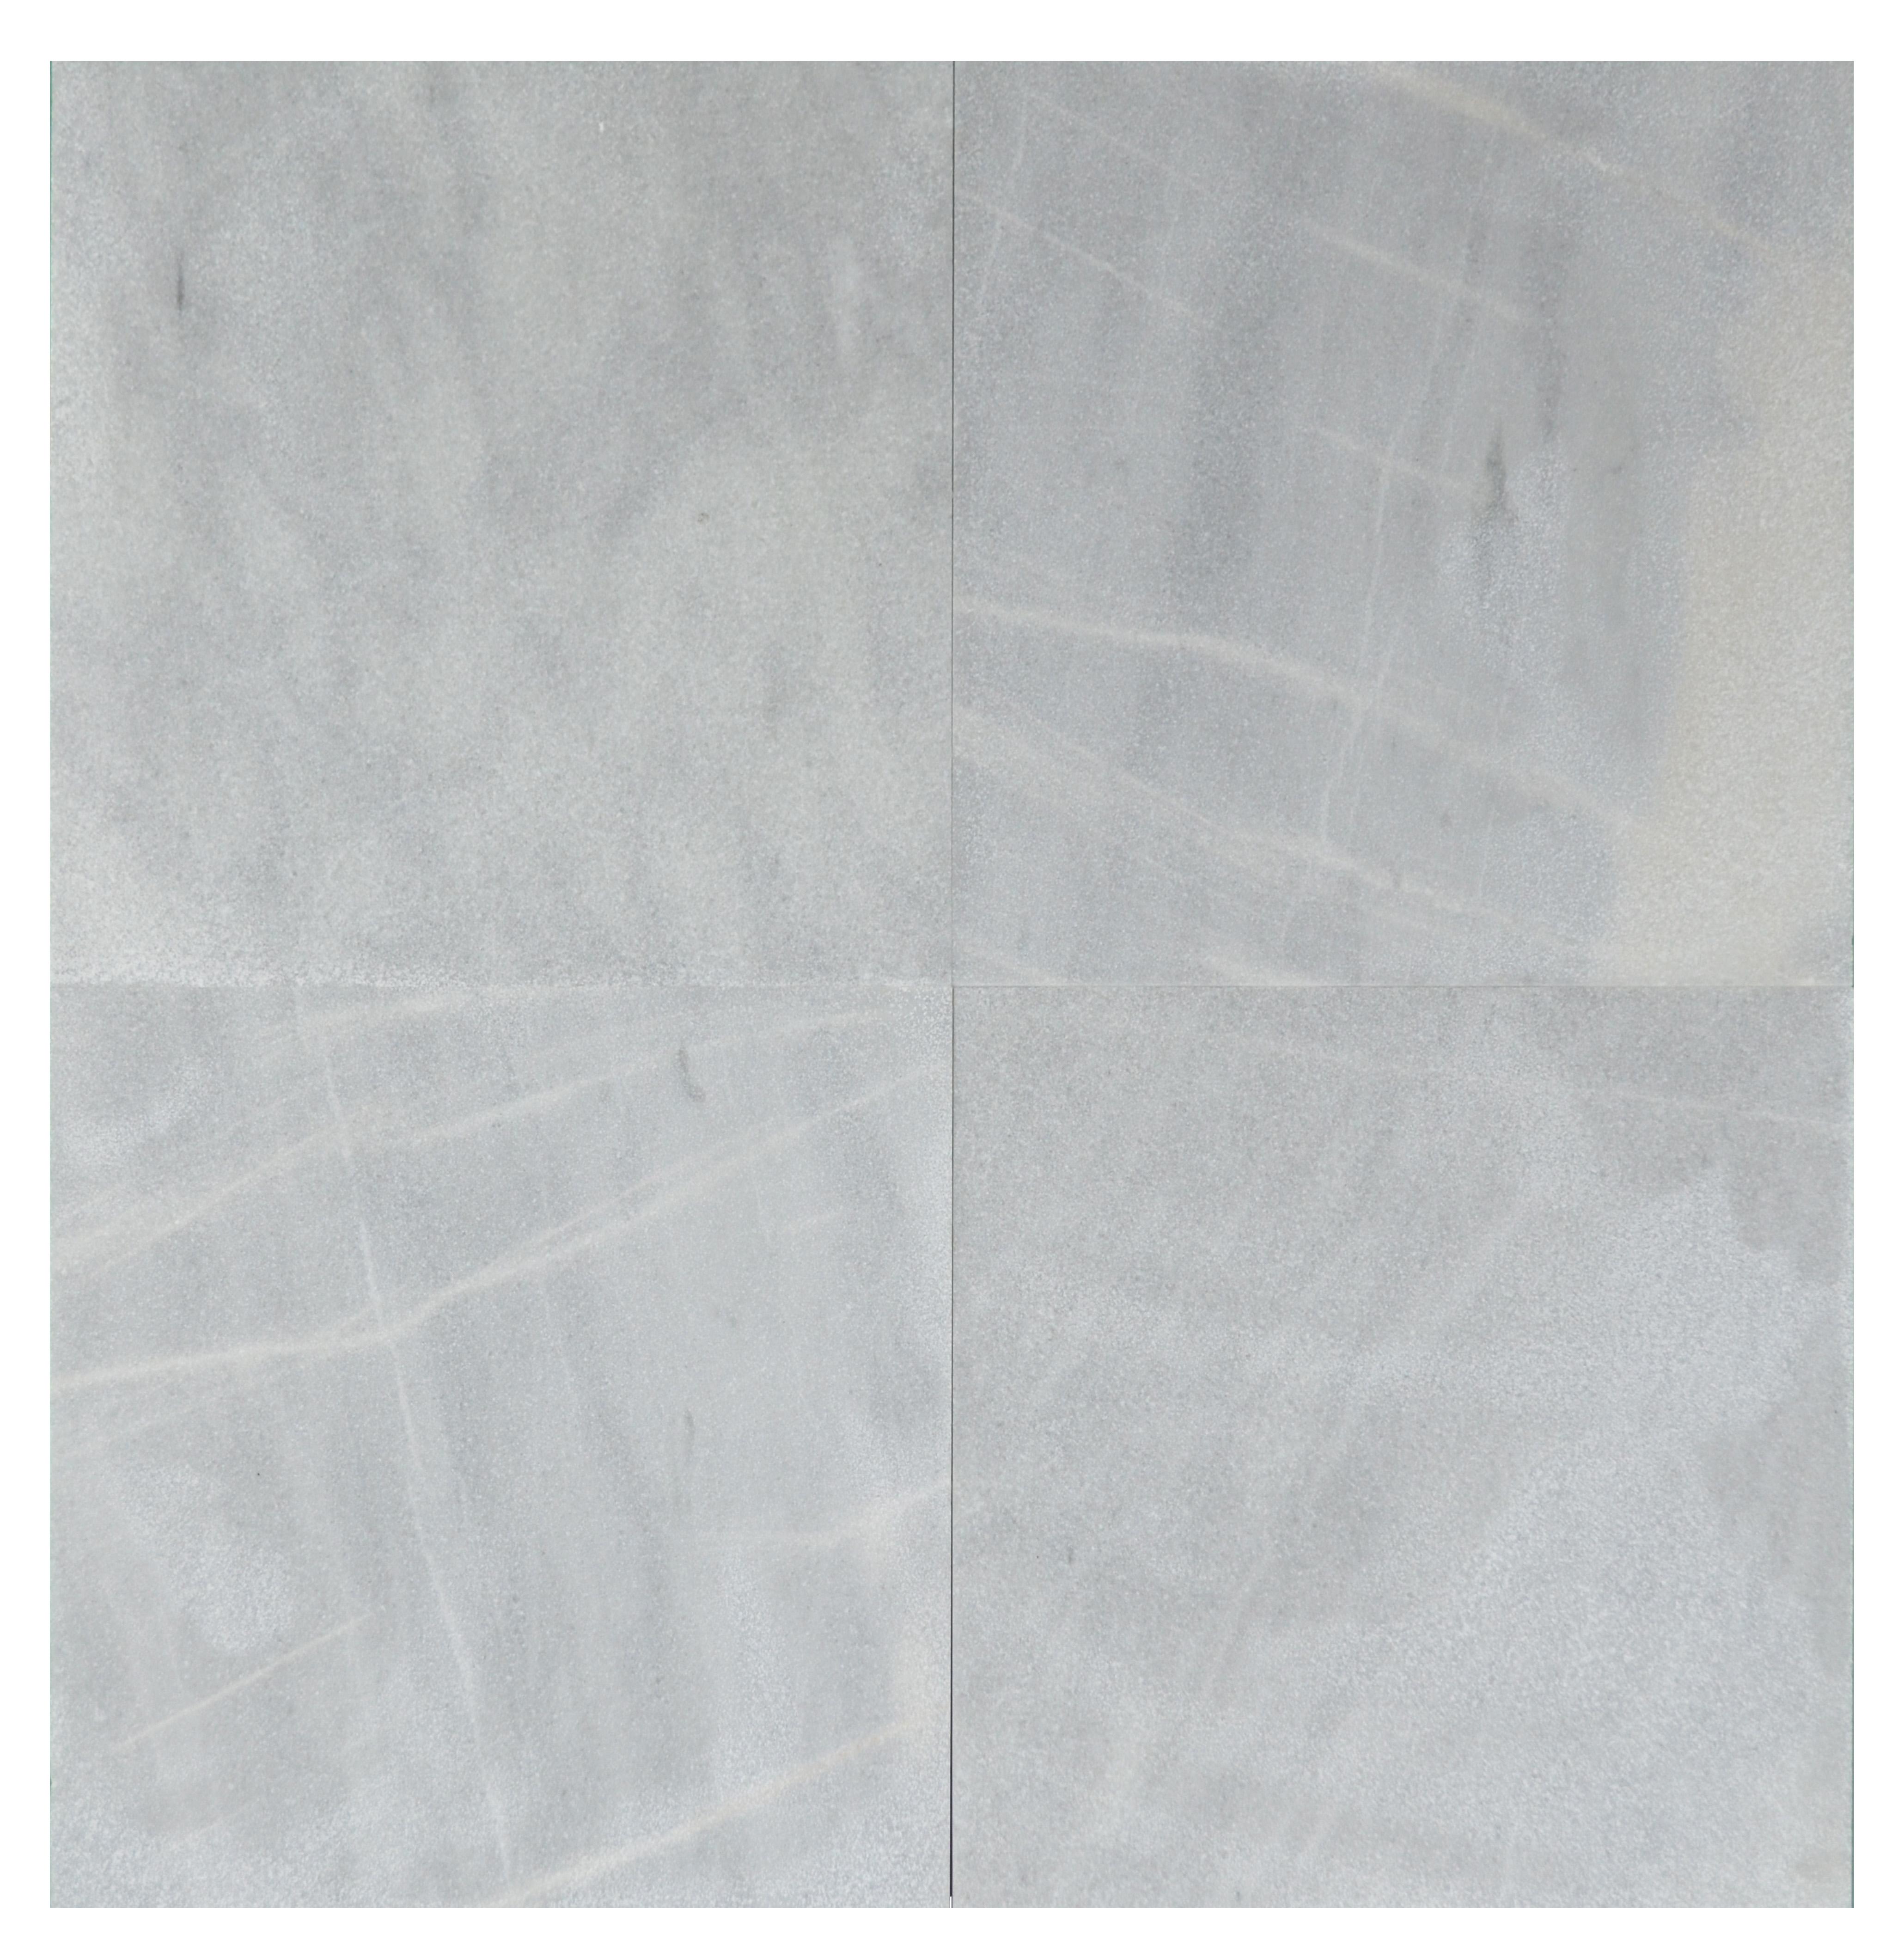 white fume sandblasted marble tiles 18x18 -marble sale-Atlantic Stone Source (2)